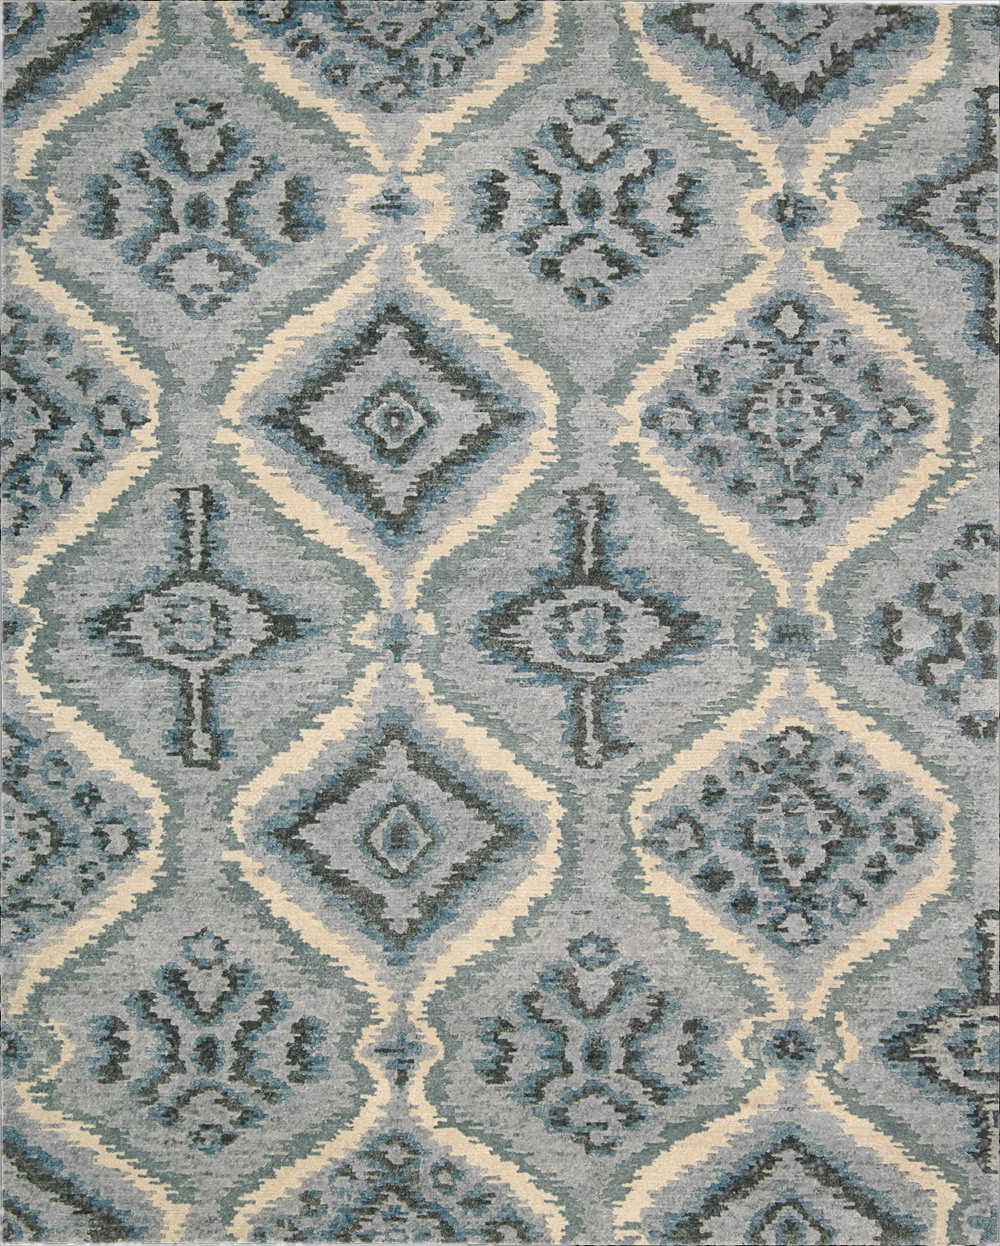 9x12 New Nourison Nourmak Hand Knotted Wool Reversible: Nourison Tahoe Modern MTA06 DENBL Demin Blue Area Rug